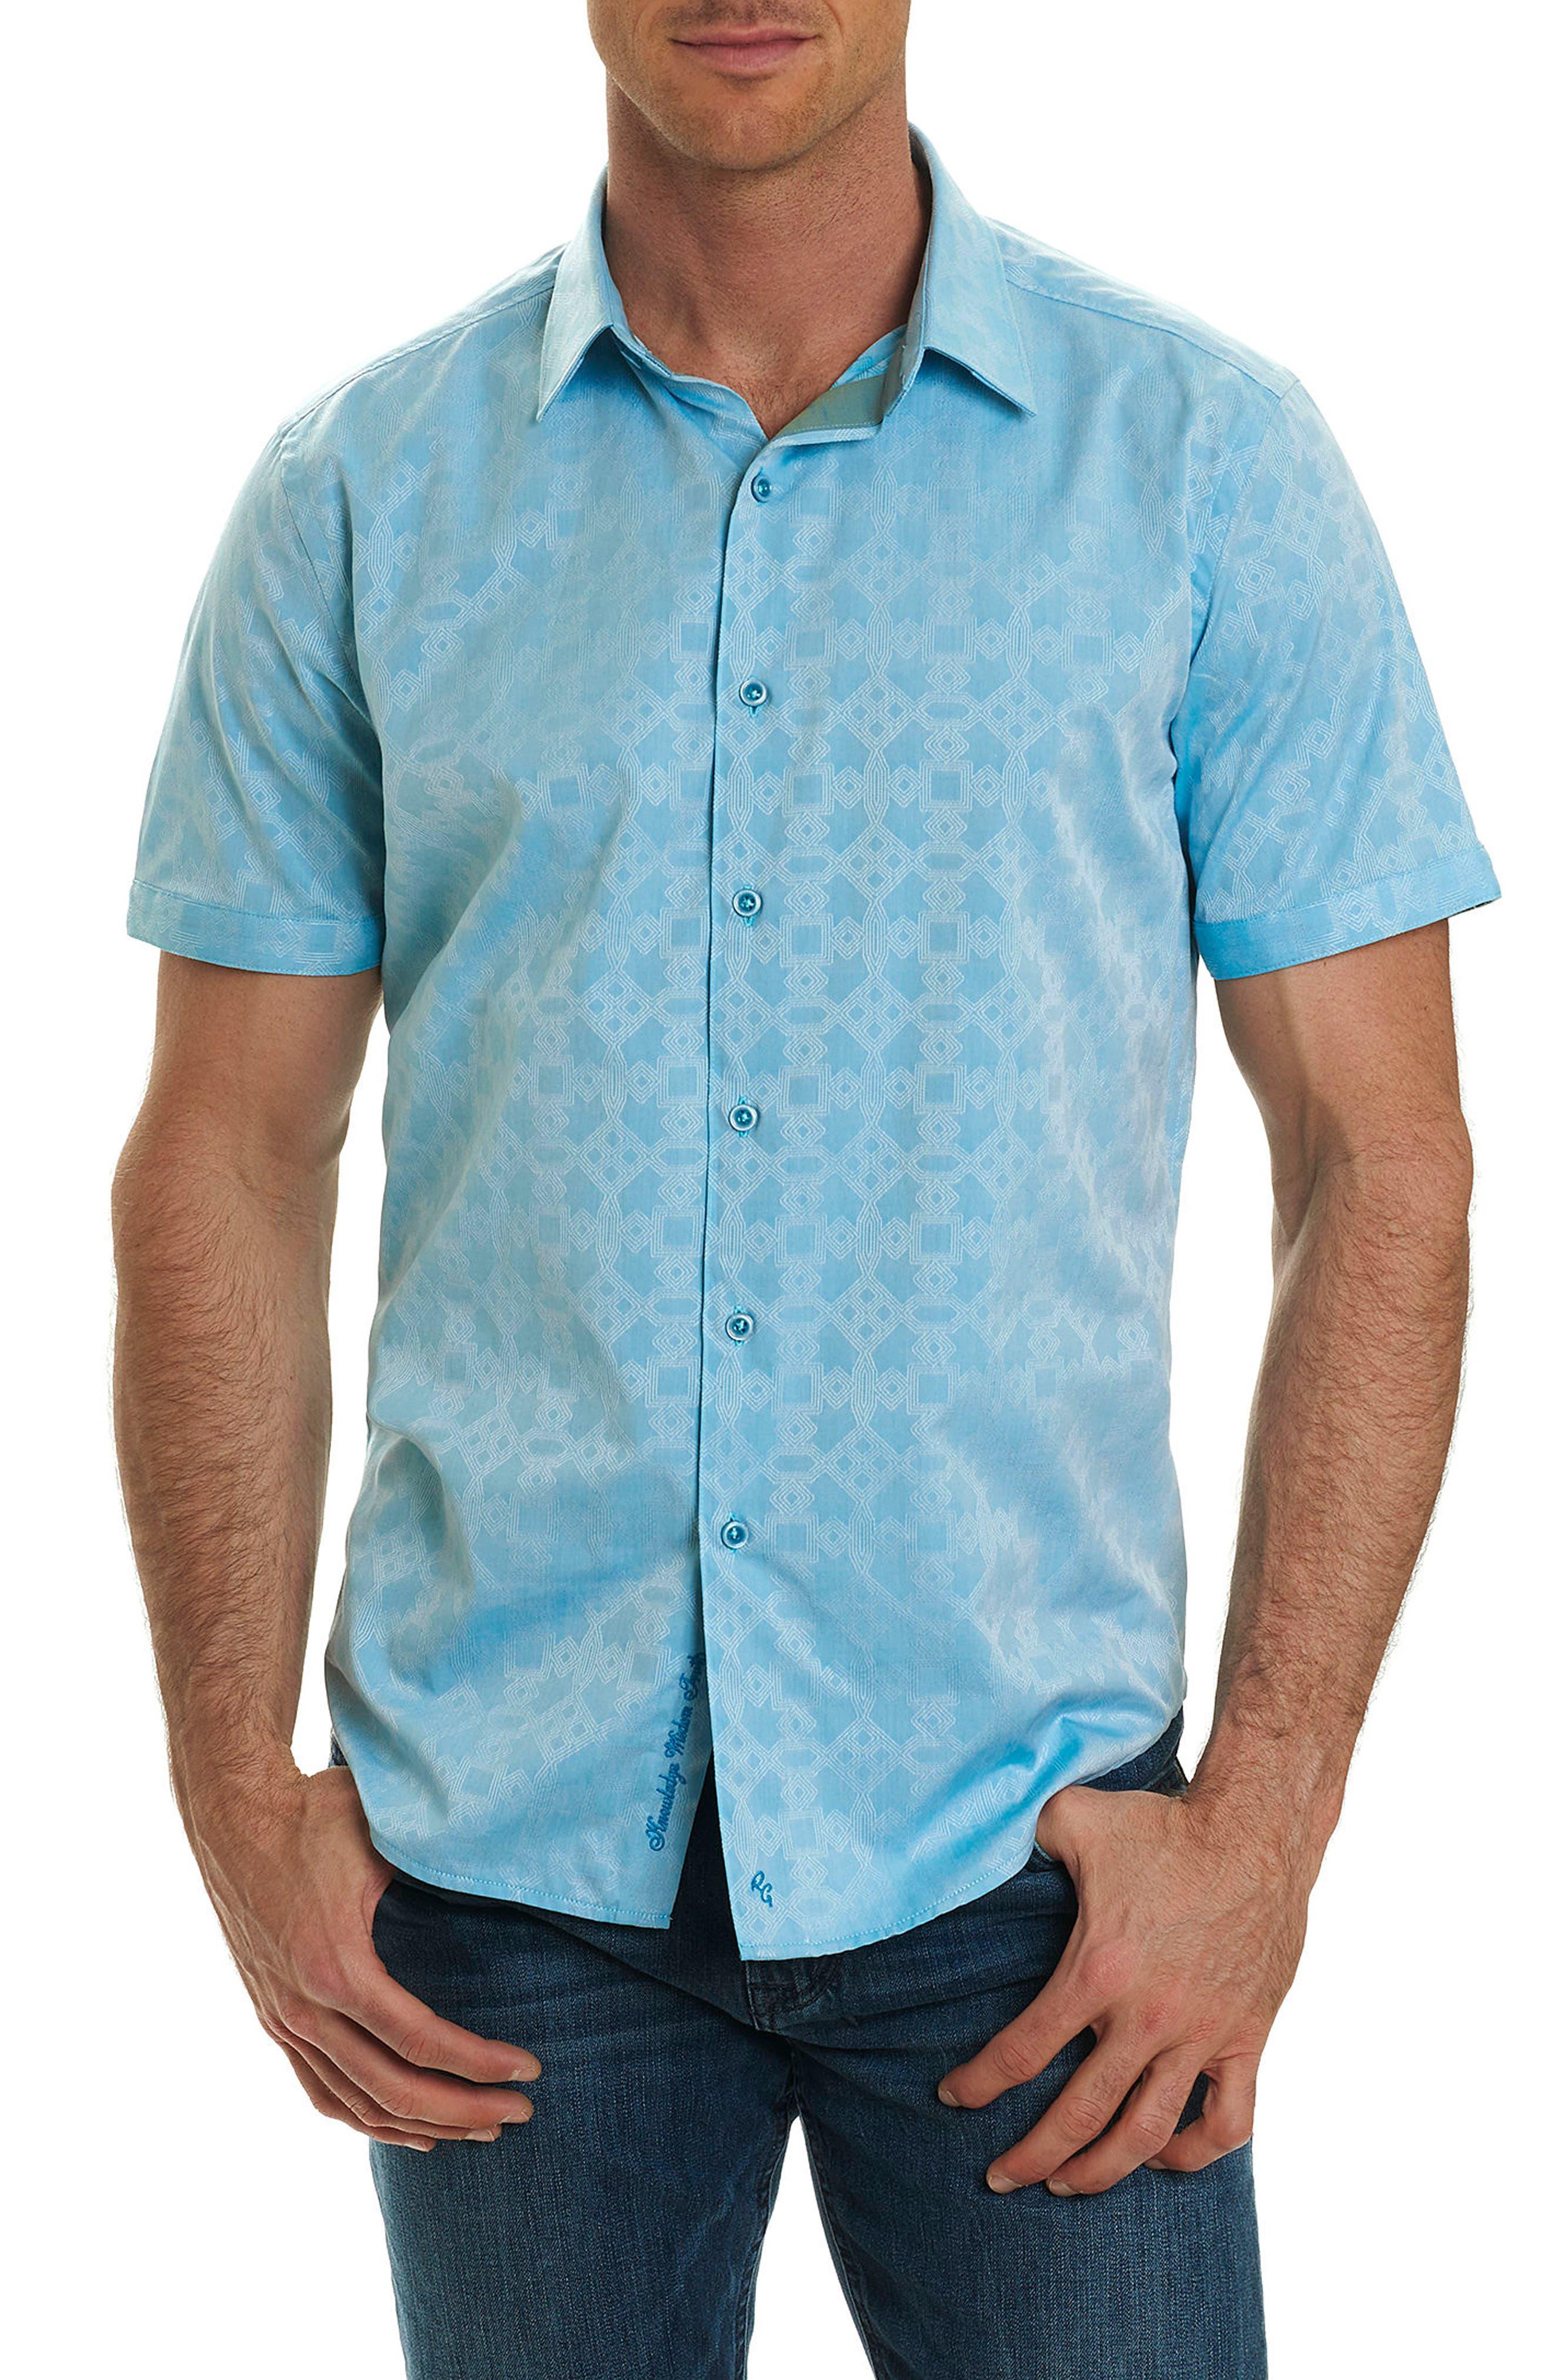 Maya Bay Classic Fit Jacquard Sport Shirt,                         Main,                         color, Turquoise